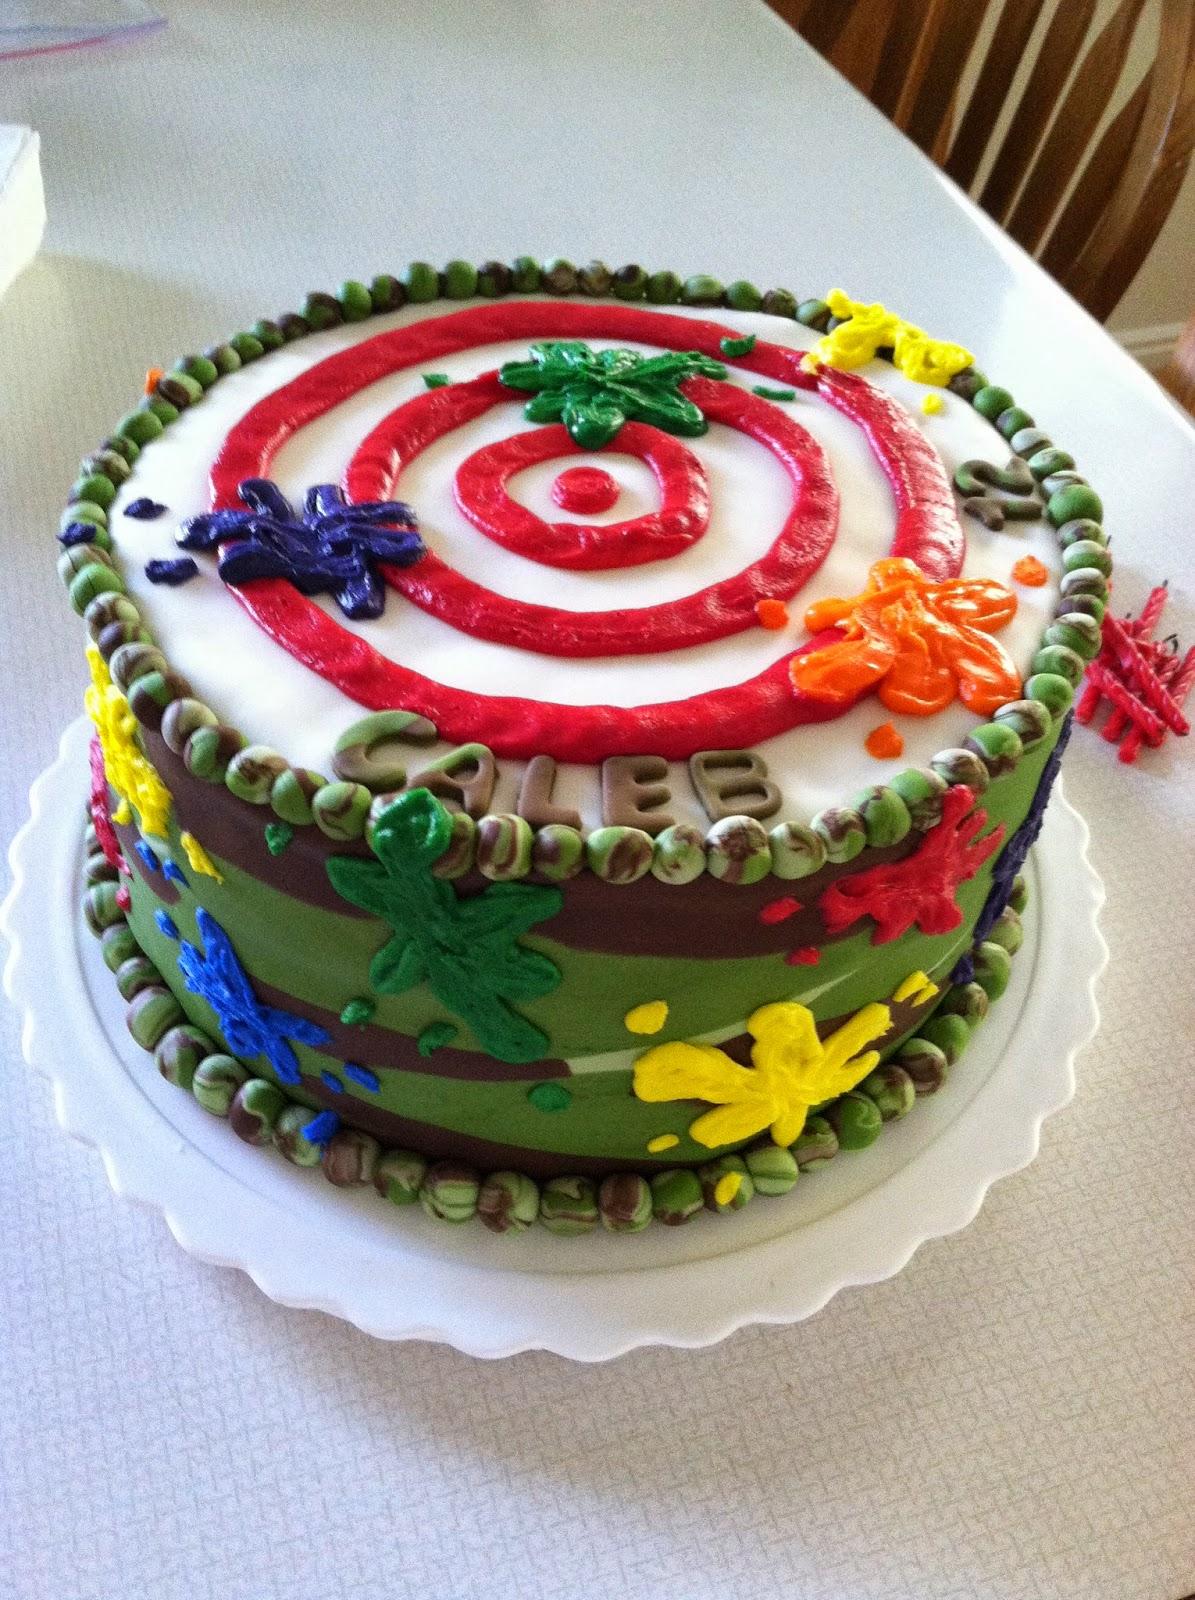 Soccer Ball Cake Design : Creative Cakes By Angela: Paintball and Camo Cake